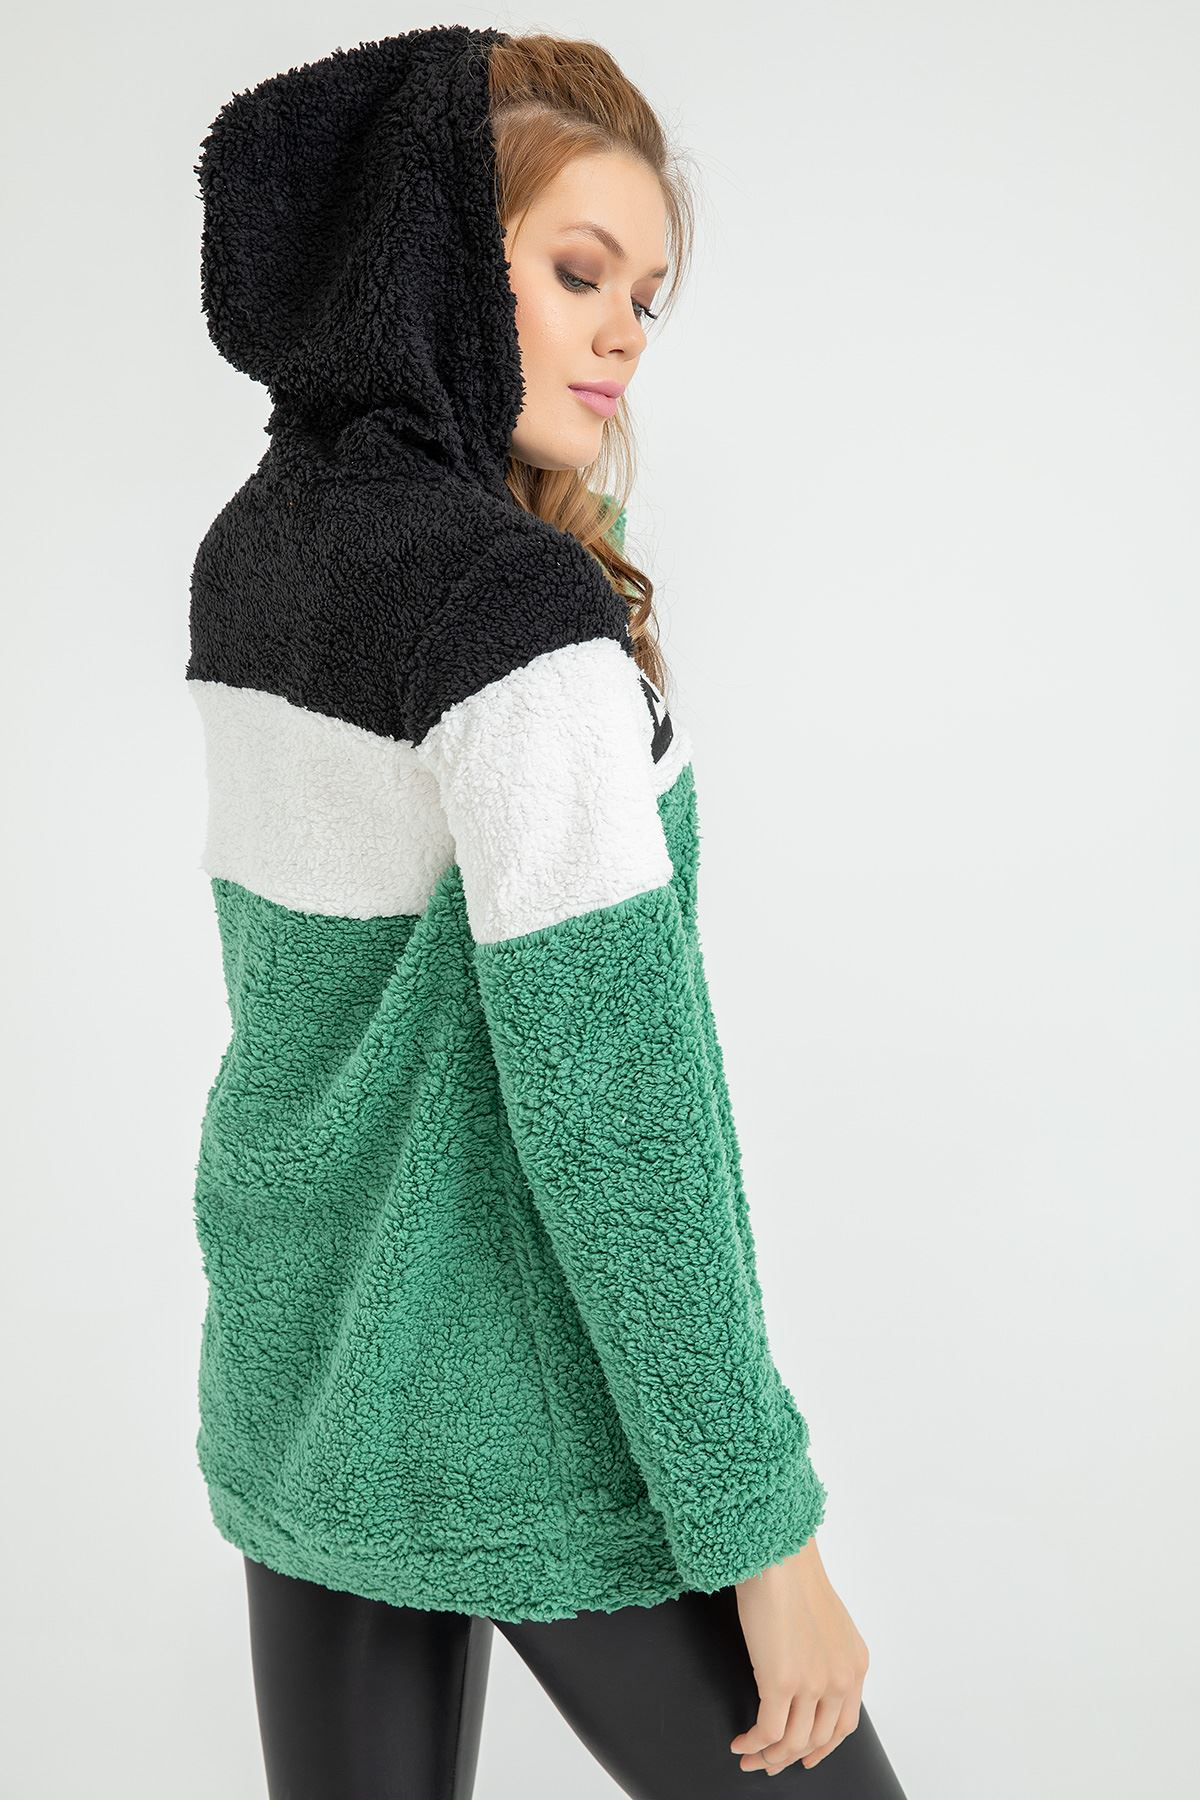 Kuzu Nakış Detay Sweatshirt-Mint